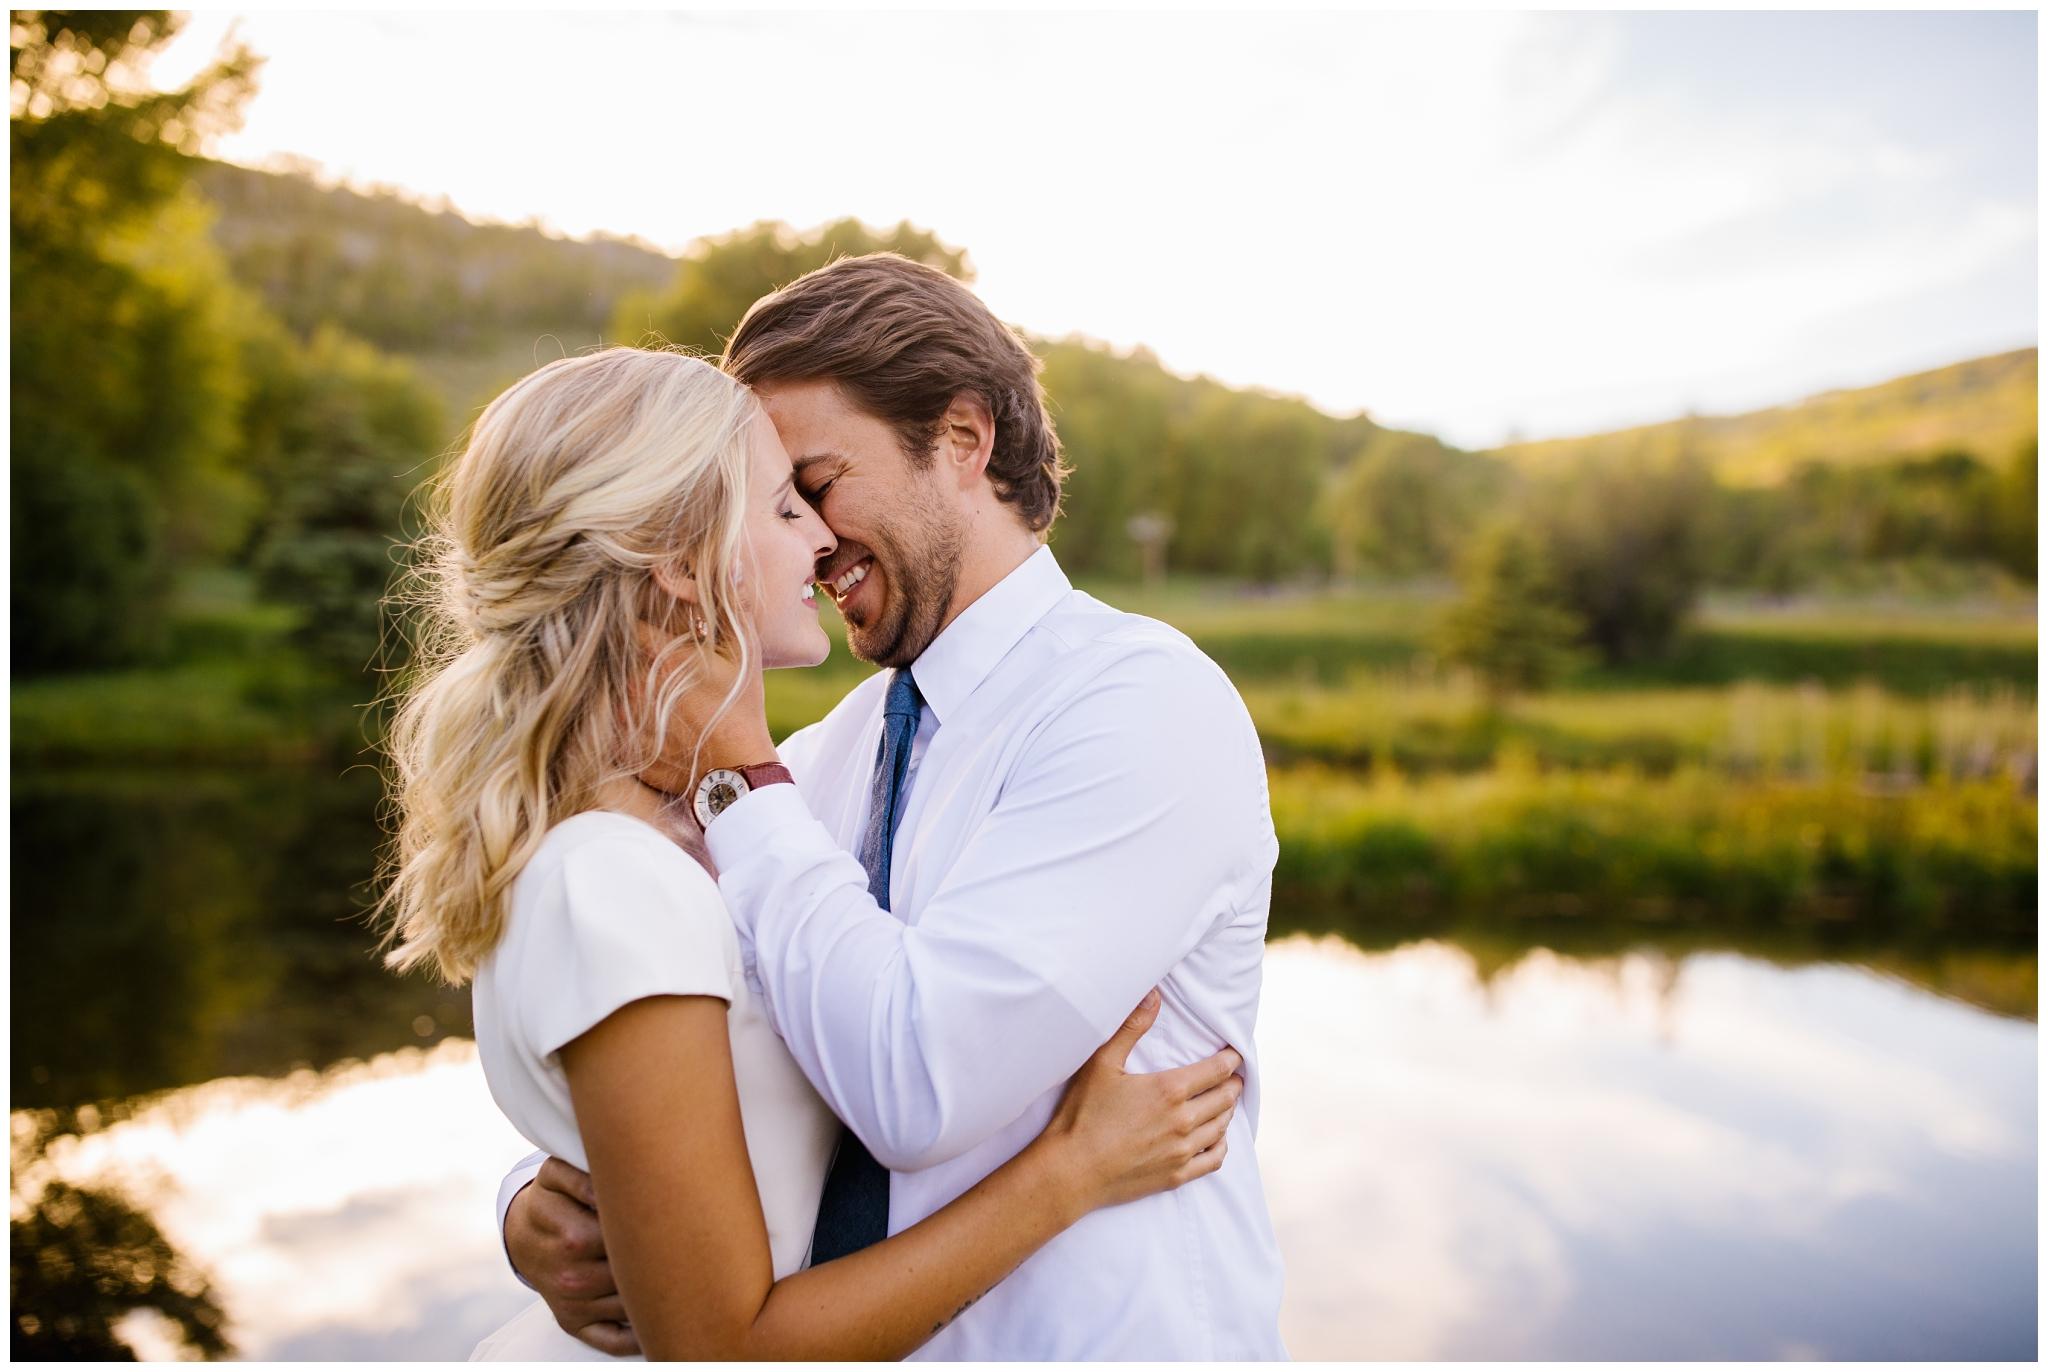 Lizzie-B-Imagery-Utah-Wedding-Photographer-Park-City-Photographer_0055.jpg